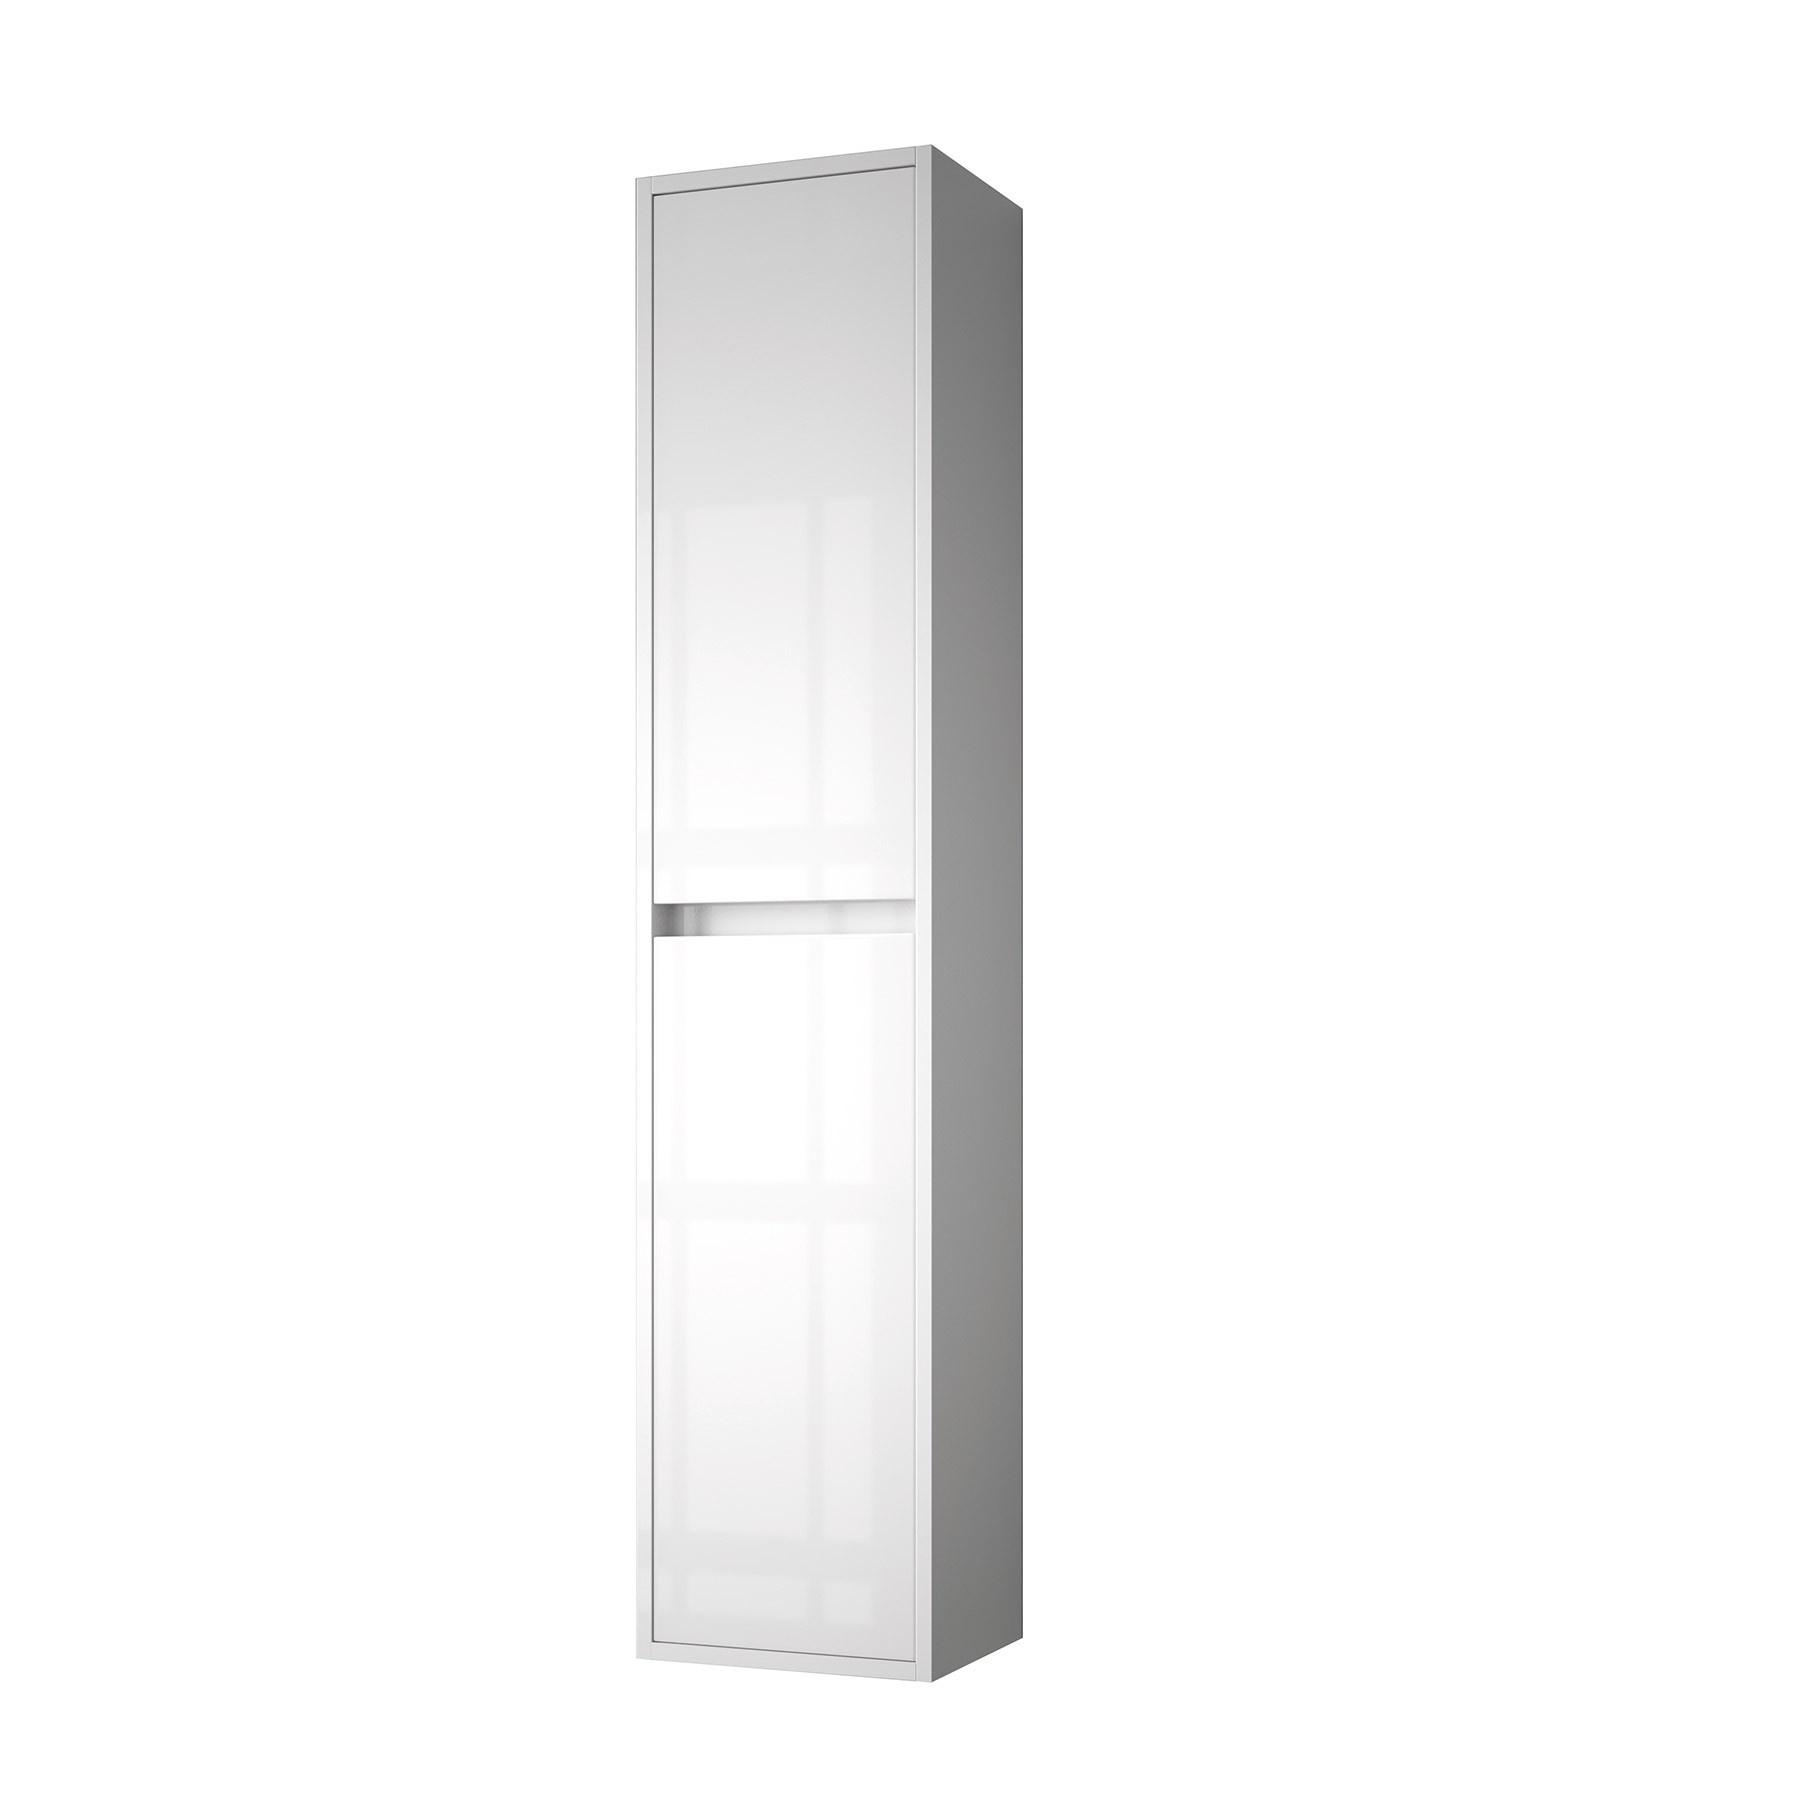 Badkamermeubel Complete set Koja 800 White Glossy